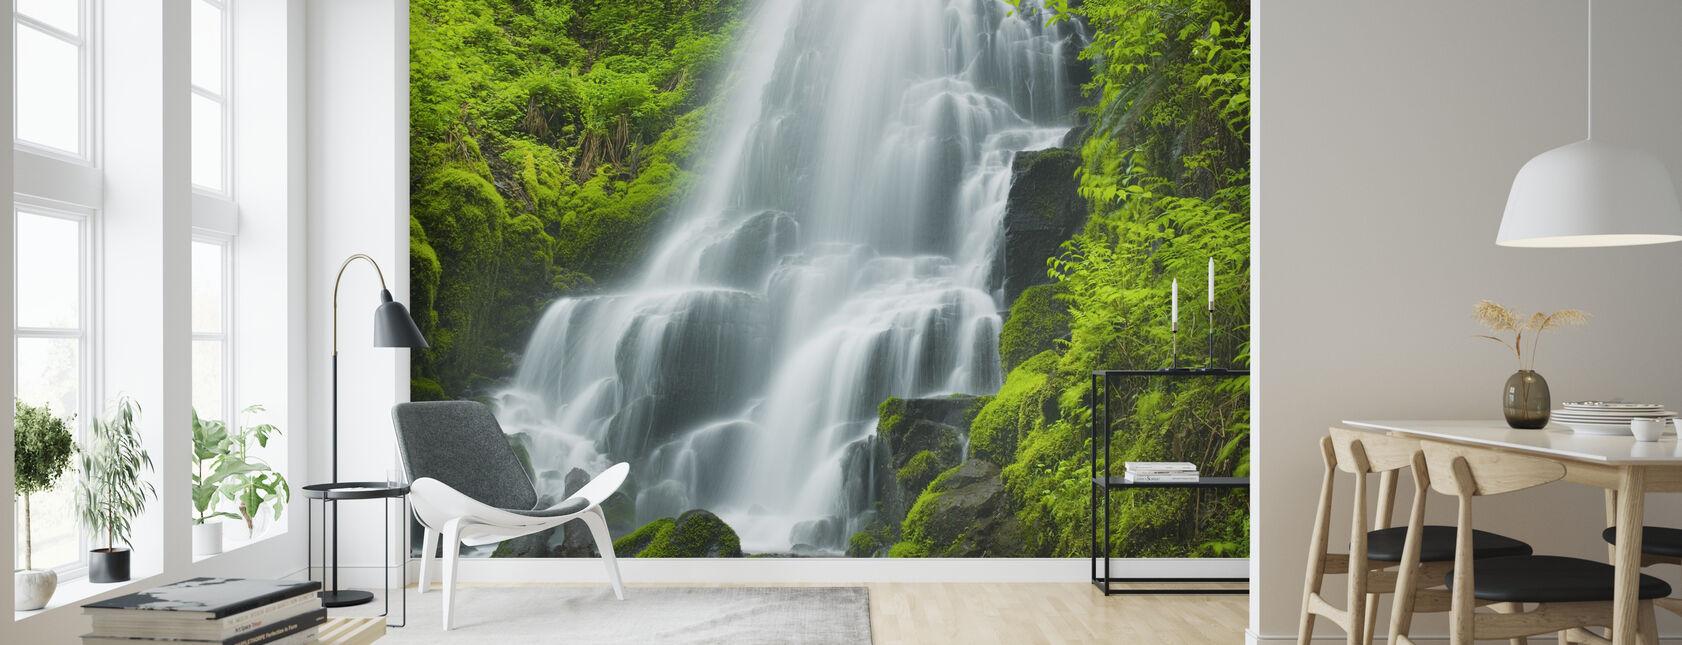 Fairy Falls - Wallpaper - Living Room